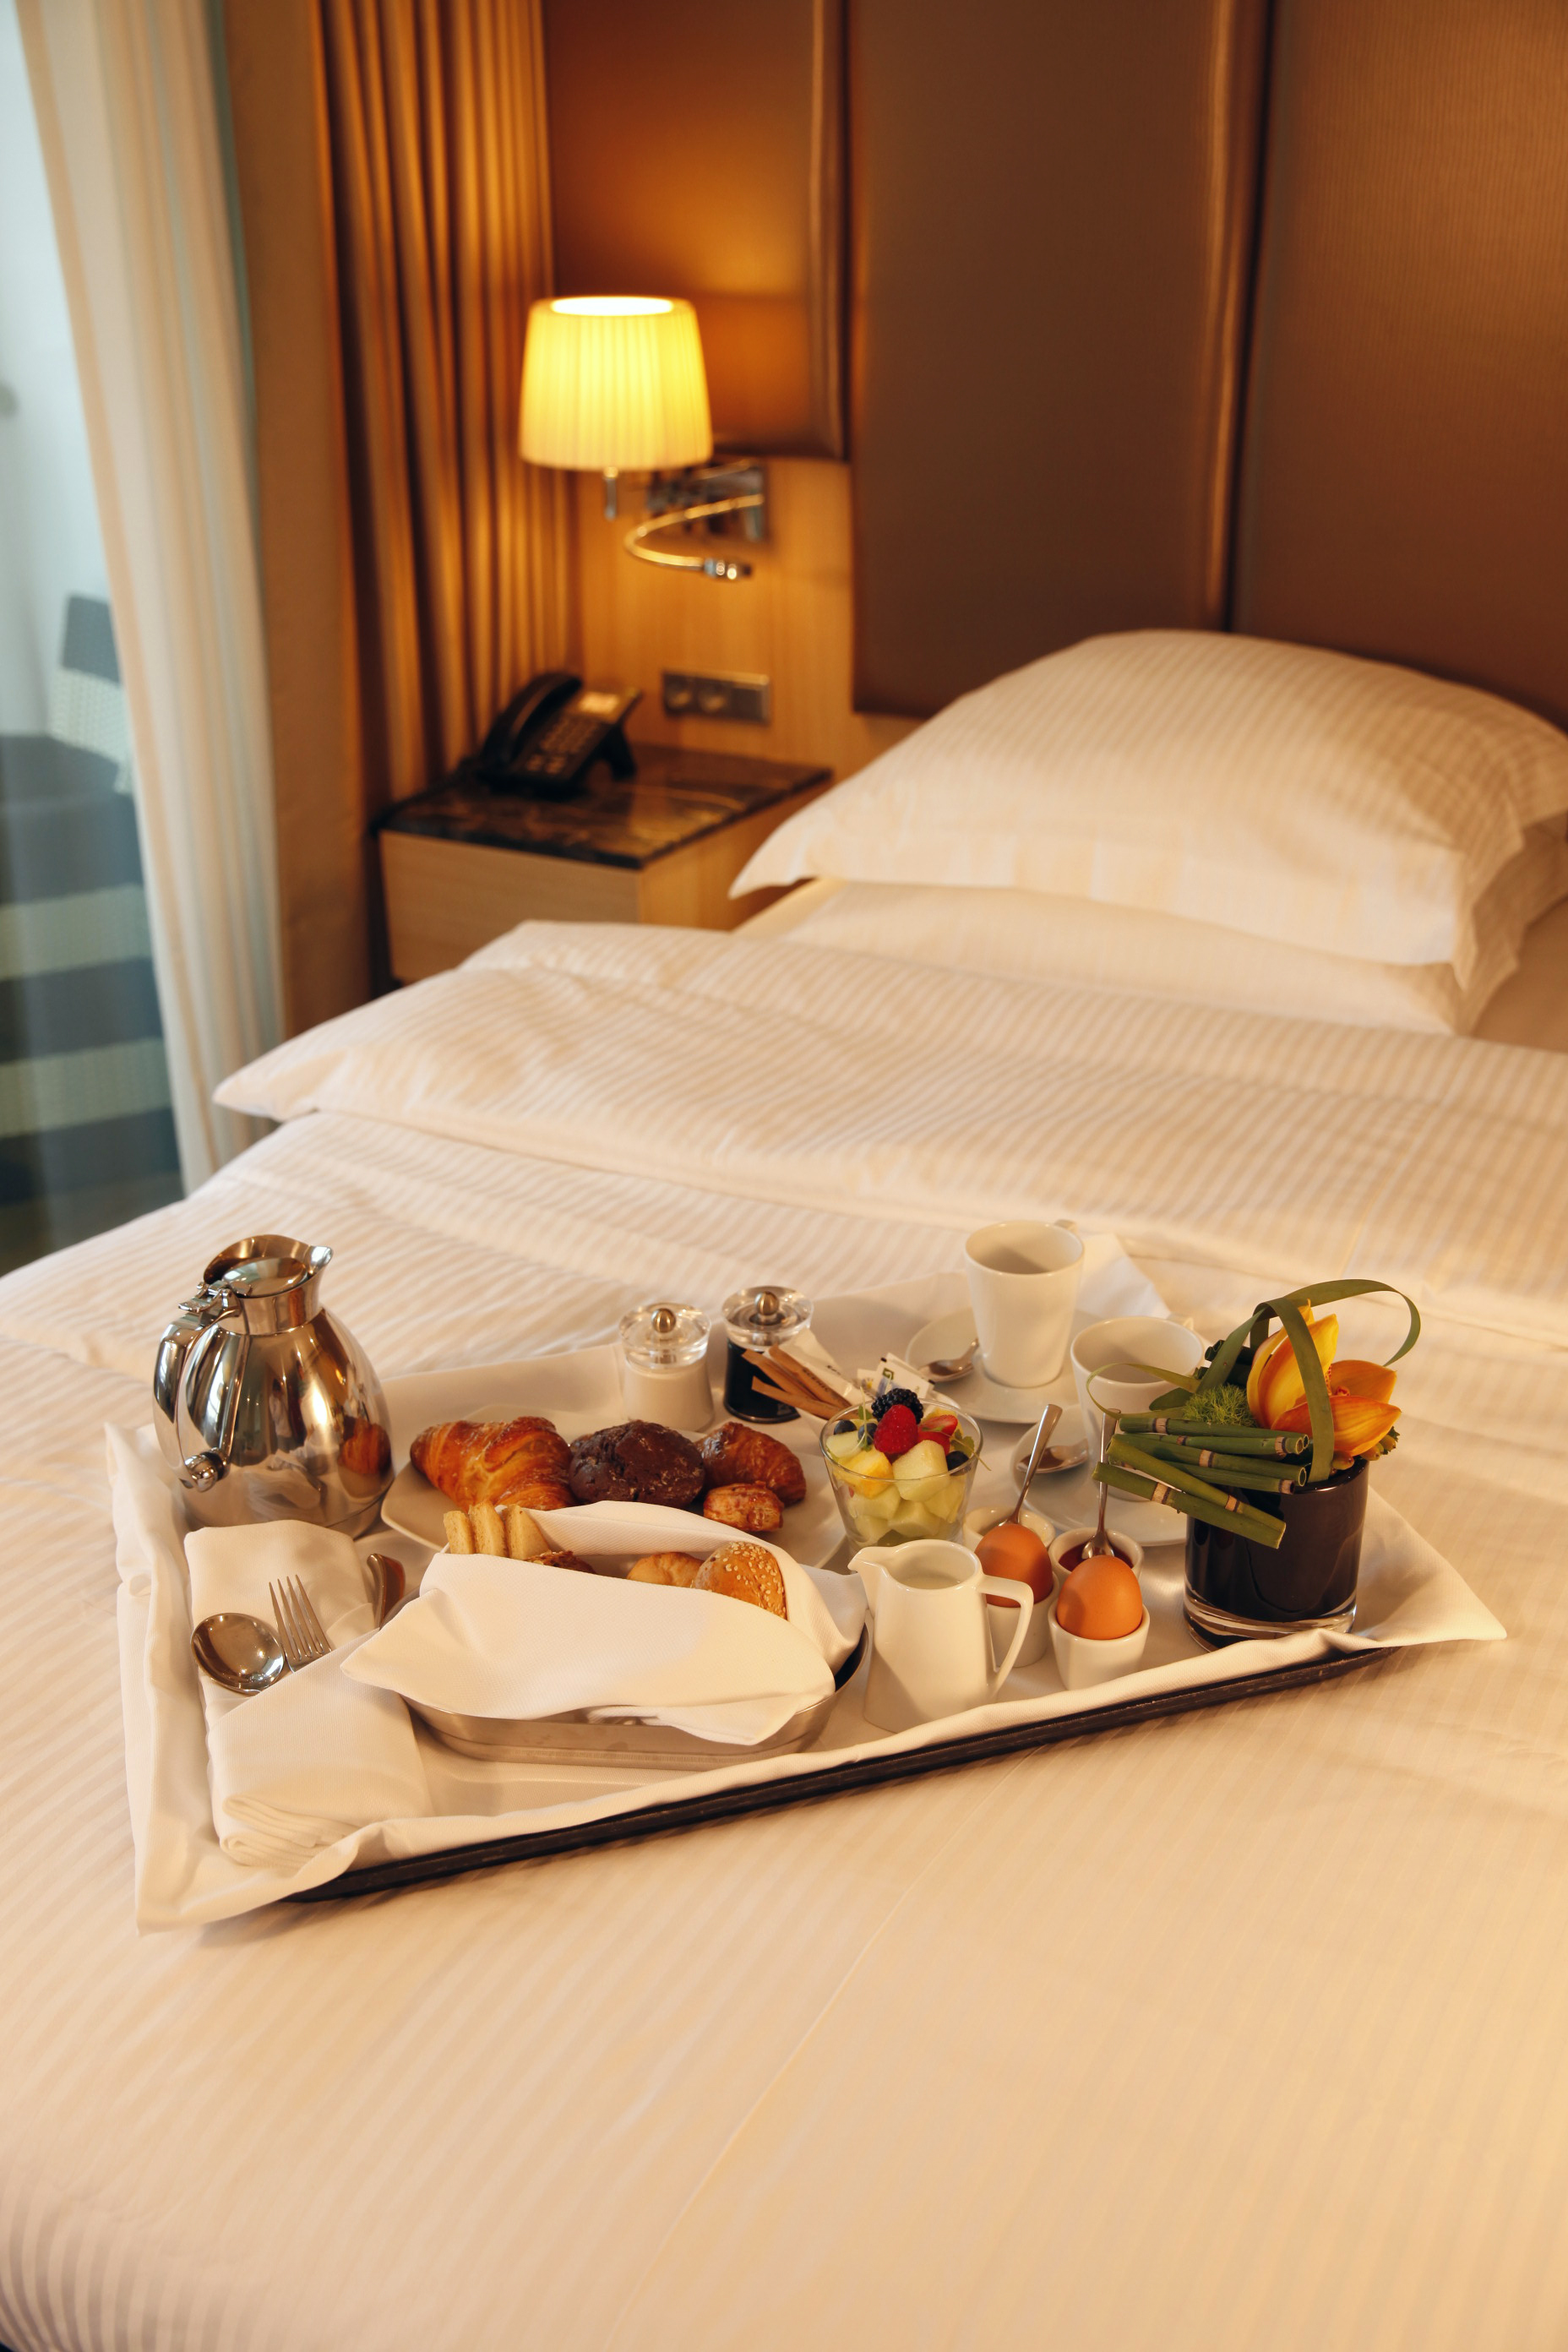 Scenic Jasper Room Service Dining _MG_9788.jpg